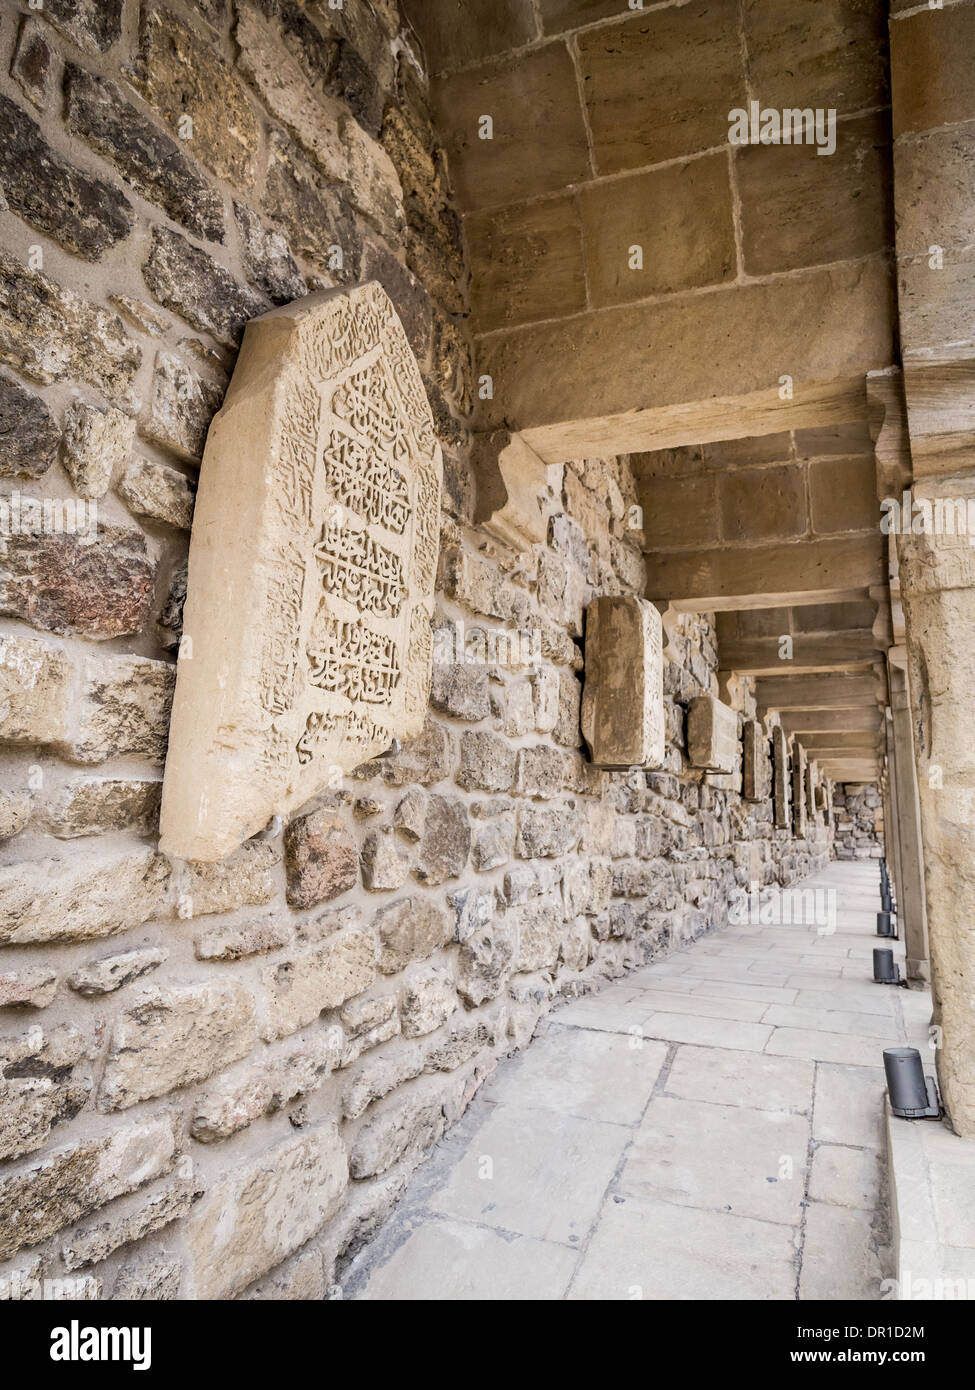 Courtyard with lapidarium in Icheri Sheher (Old Town) of Baku, Azerbaijan - Stock Image